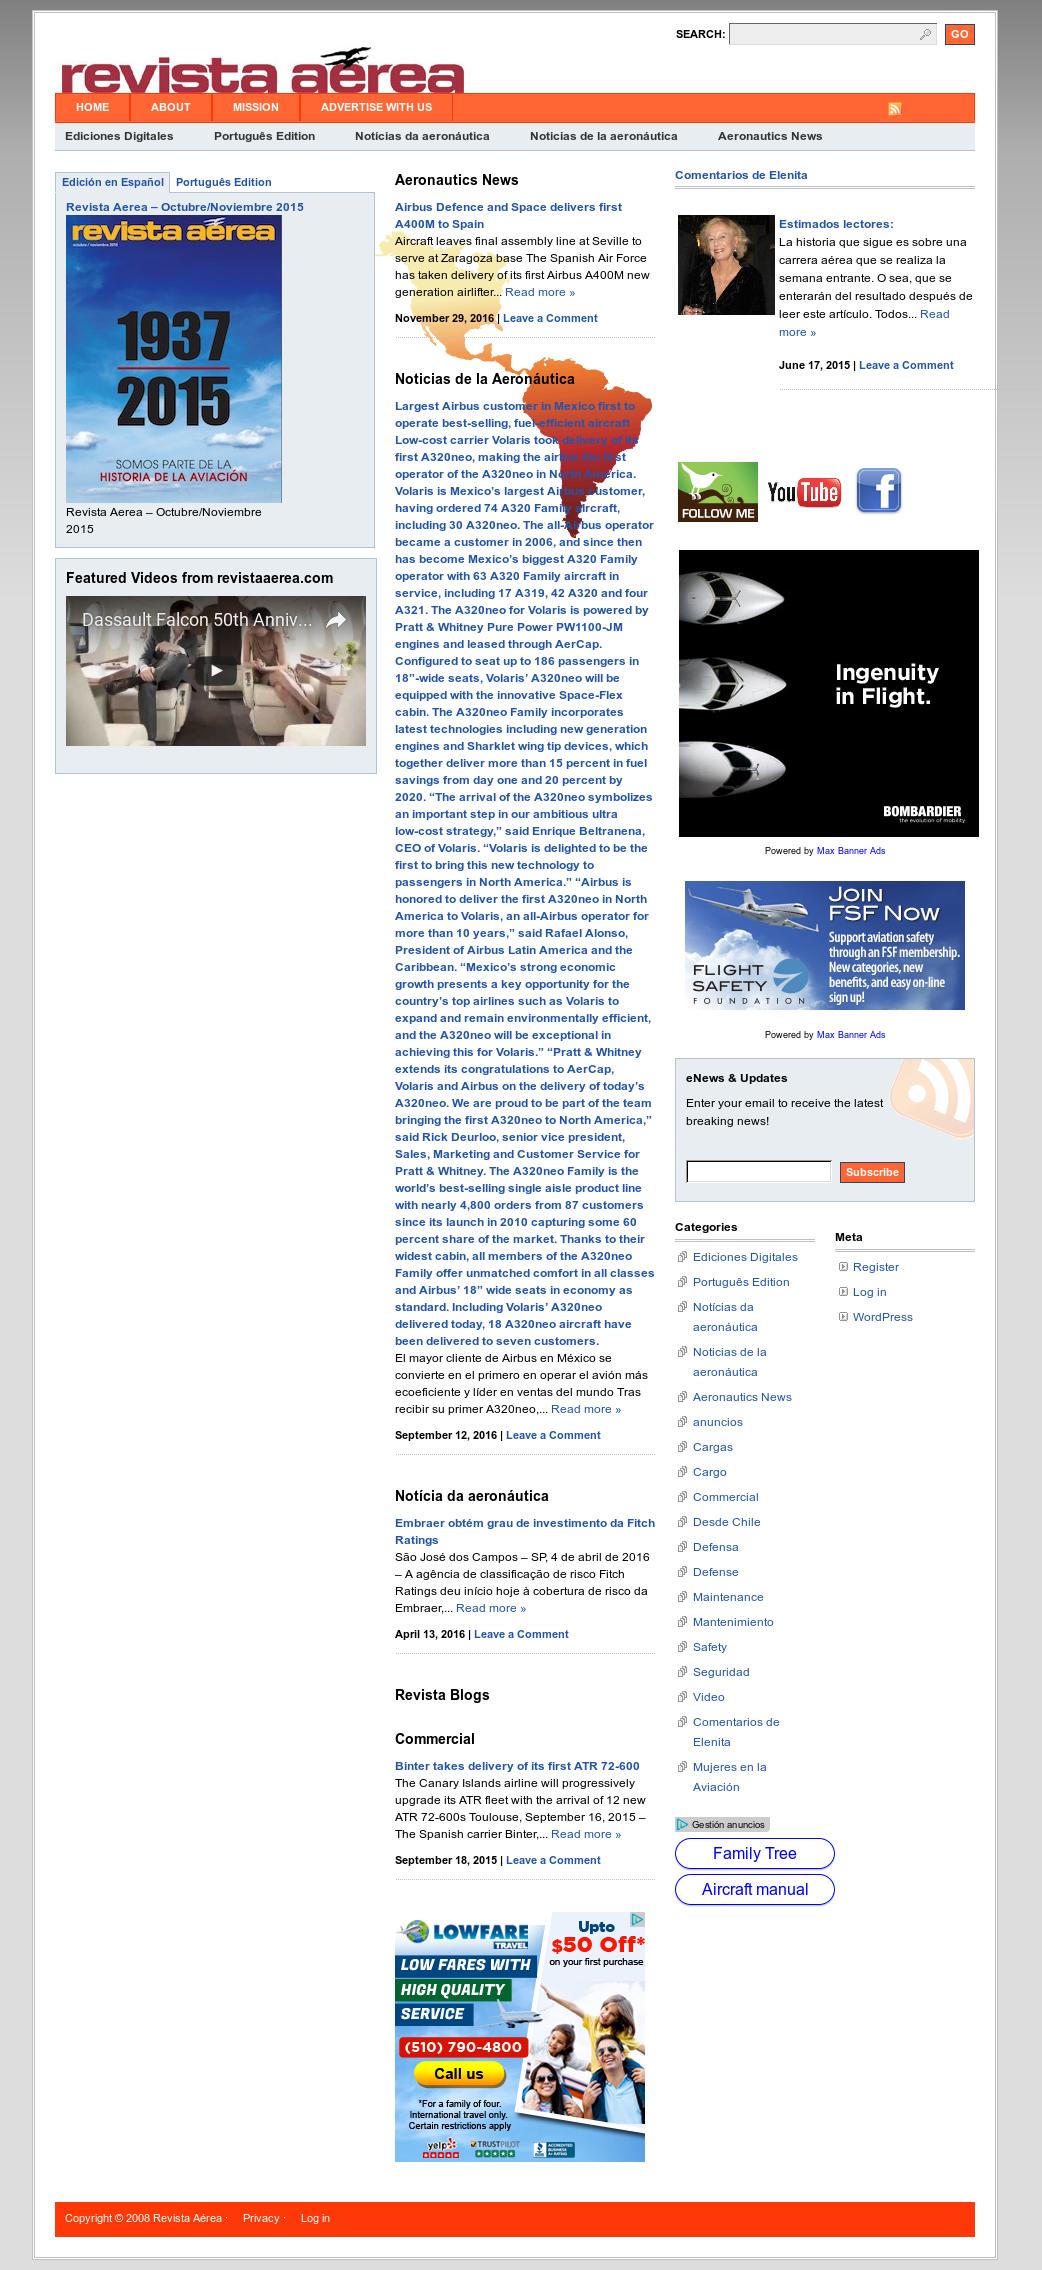 Revista Aerea Competitors, Revenue and Employees - Owler